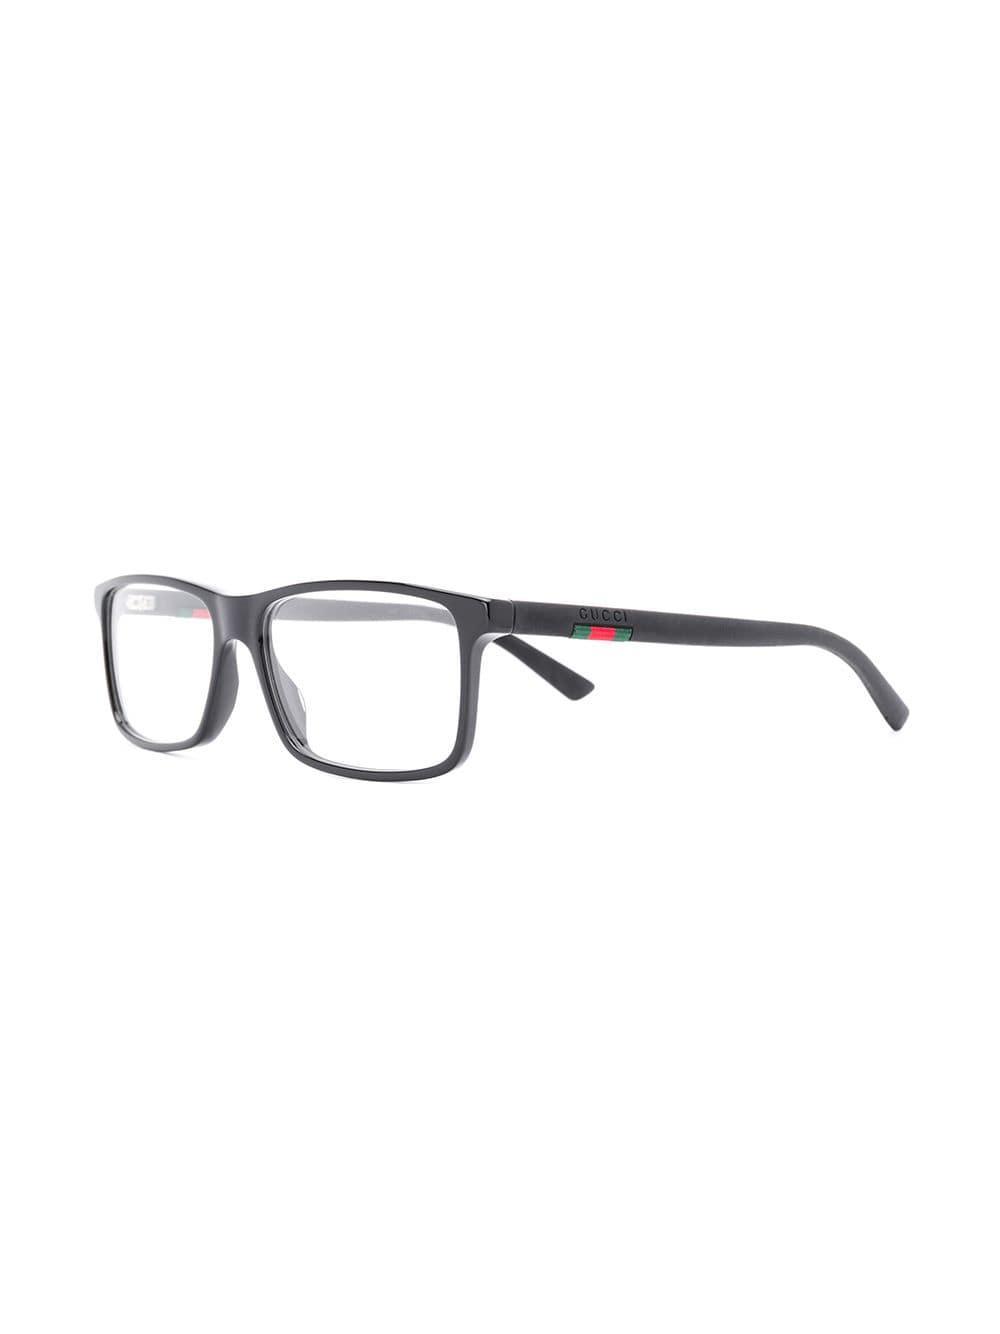 877cfeb98a Gucci - Black Rectangular Glasses for Men - Lyst. View fullscreen